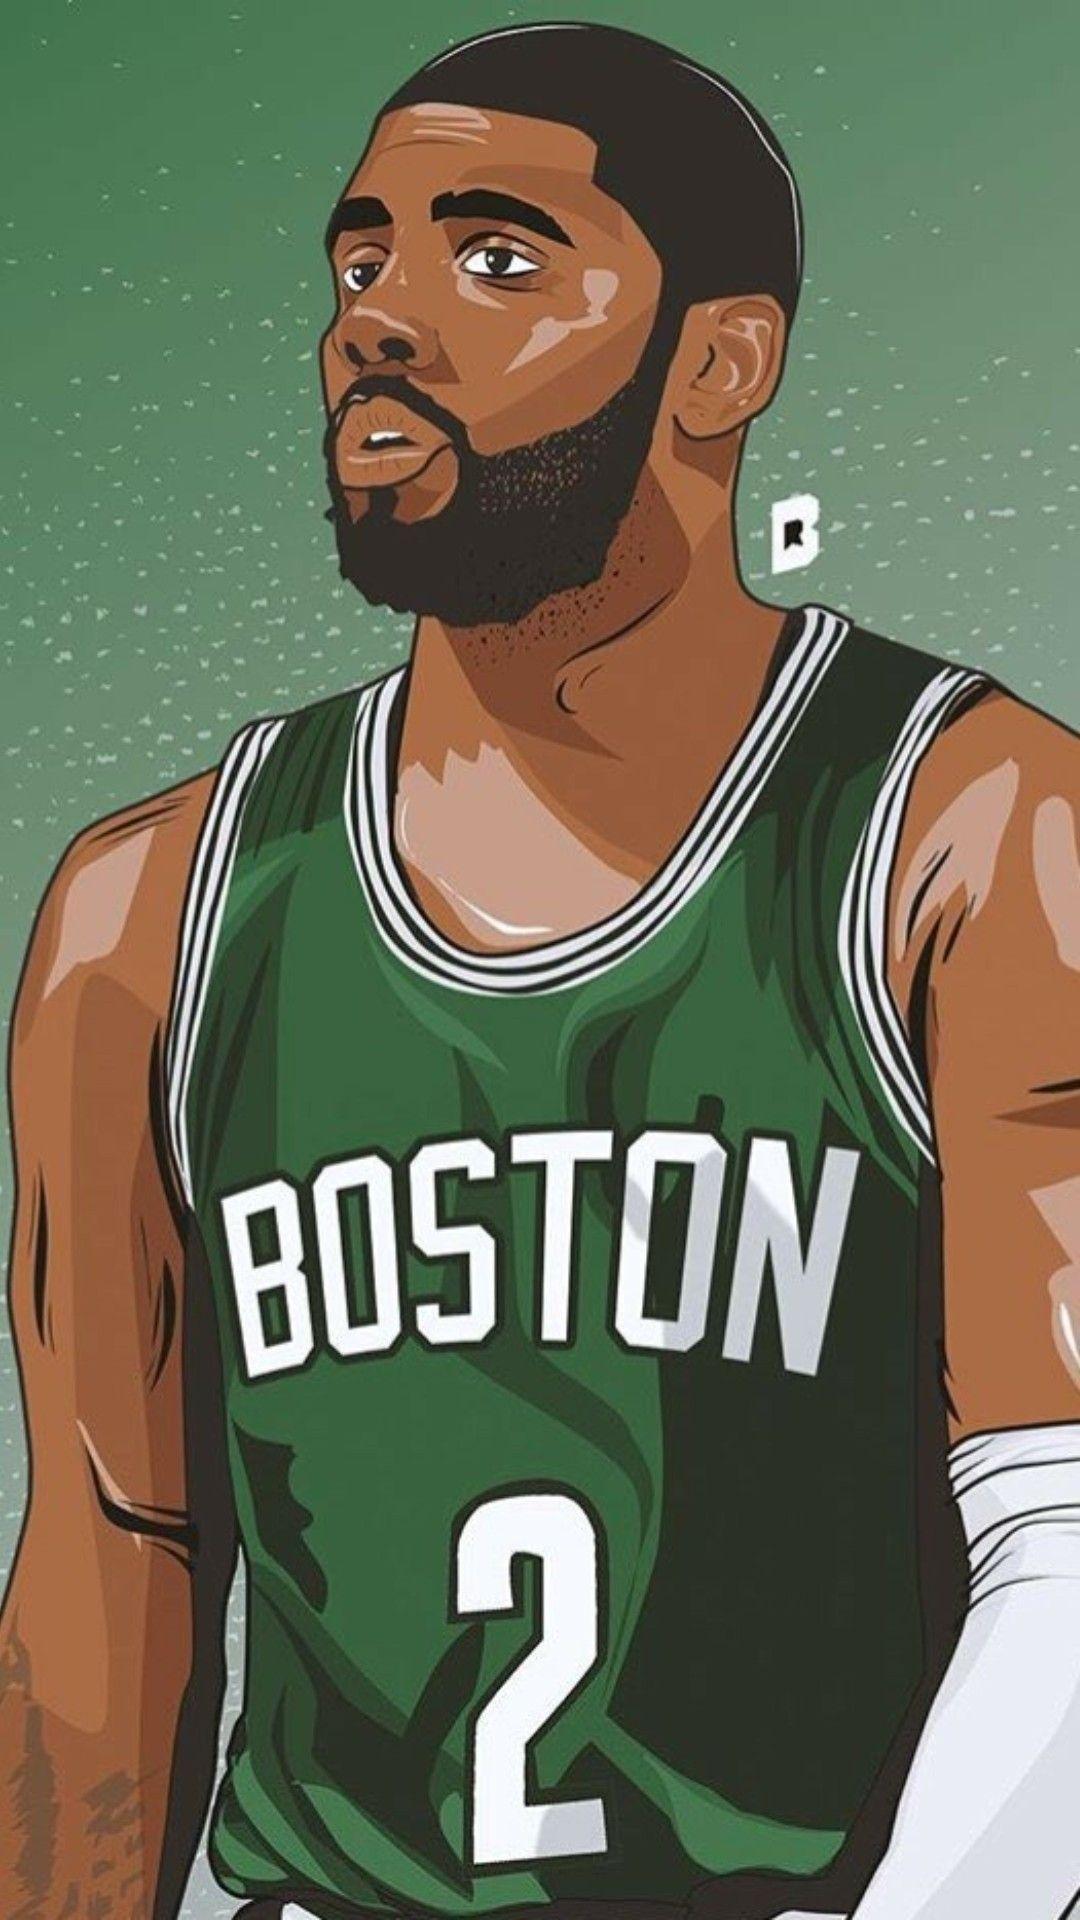 Celtics Kyrie Irving Wallpapers - Wallpaper CaveKyrie Irving Wallpaper